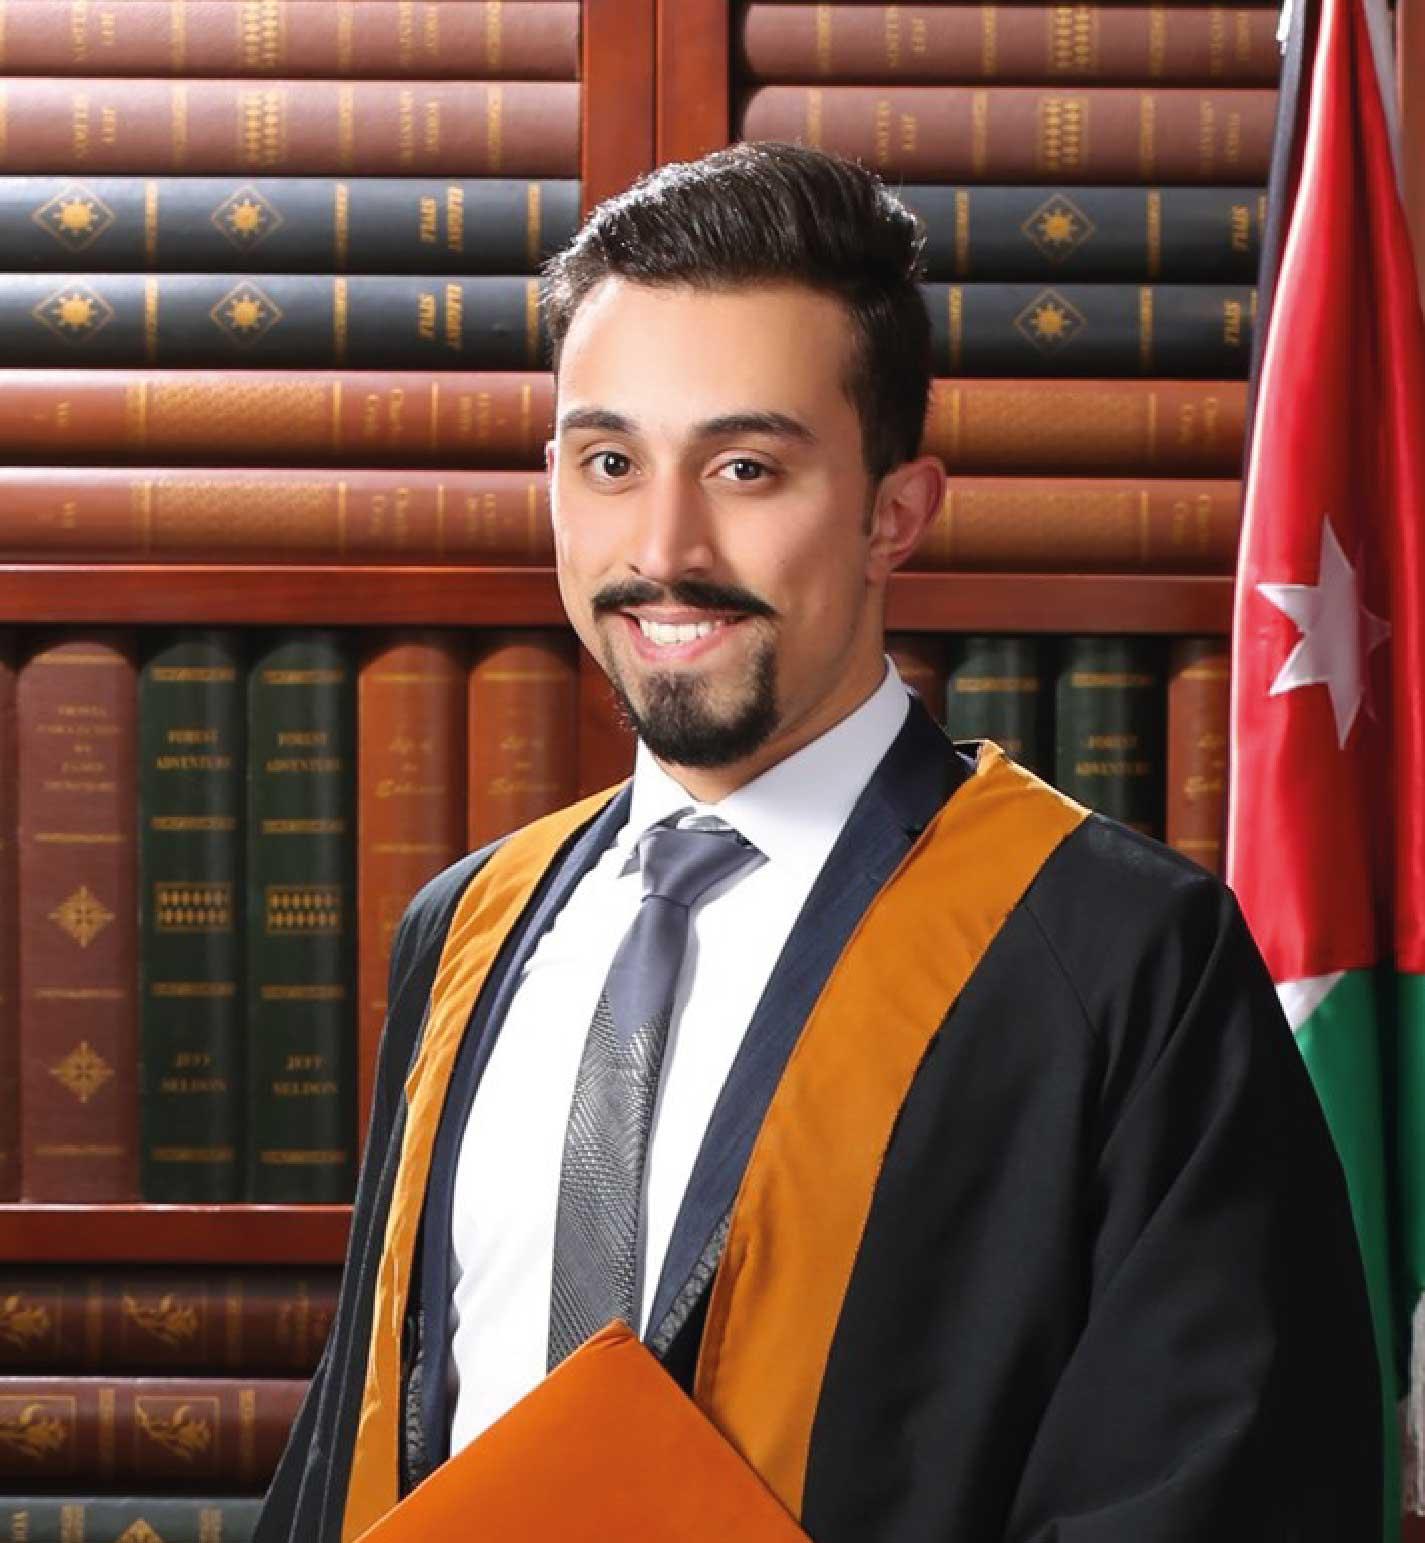 Eng. Abdallah Samih Alatari